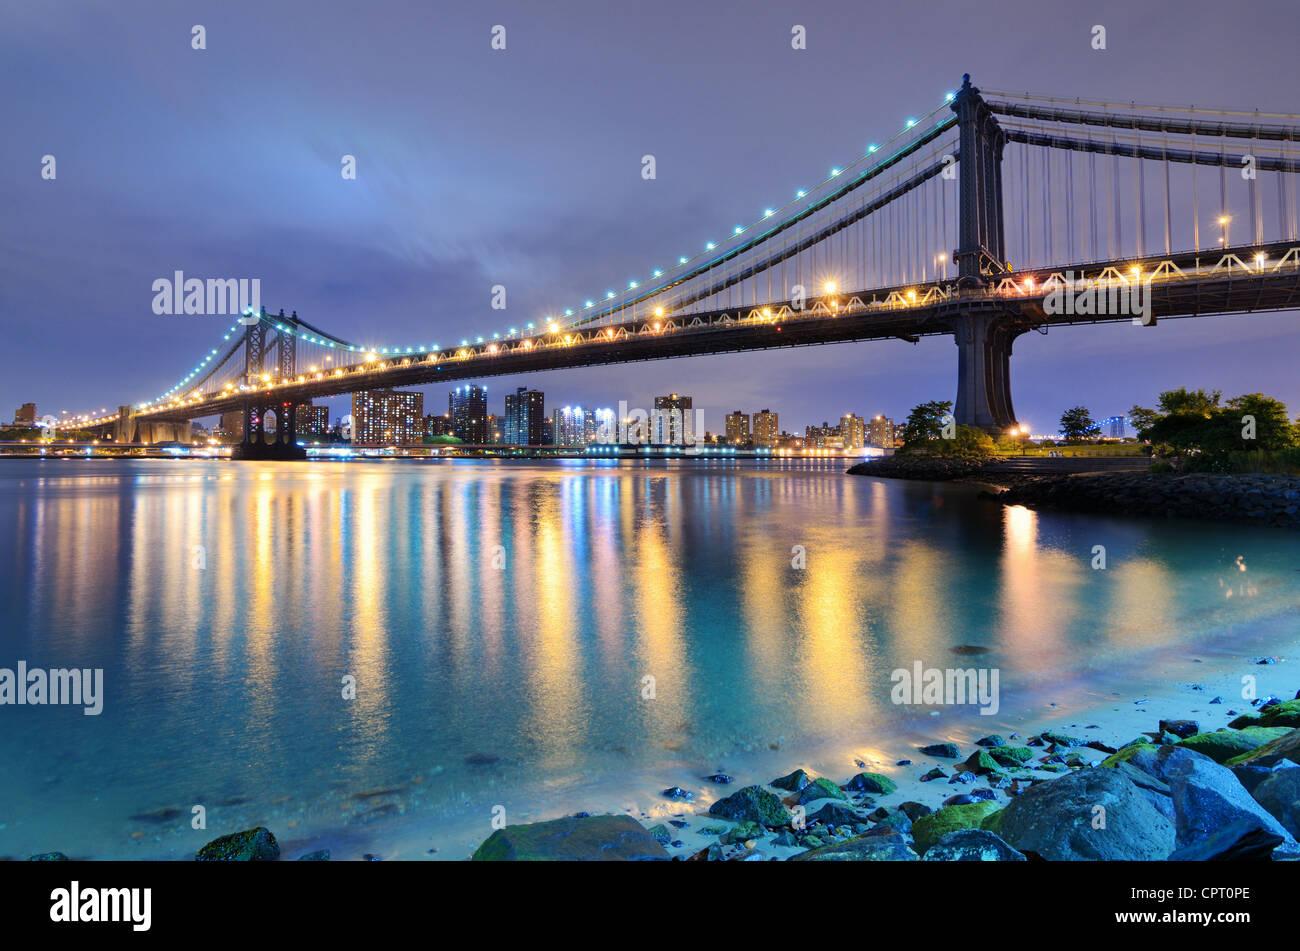 Manhattan Bridge spanning the East River towards Manhattan in New York City. - Stock Image